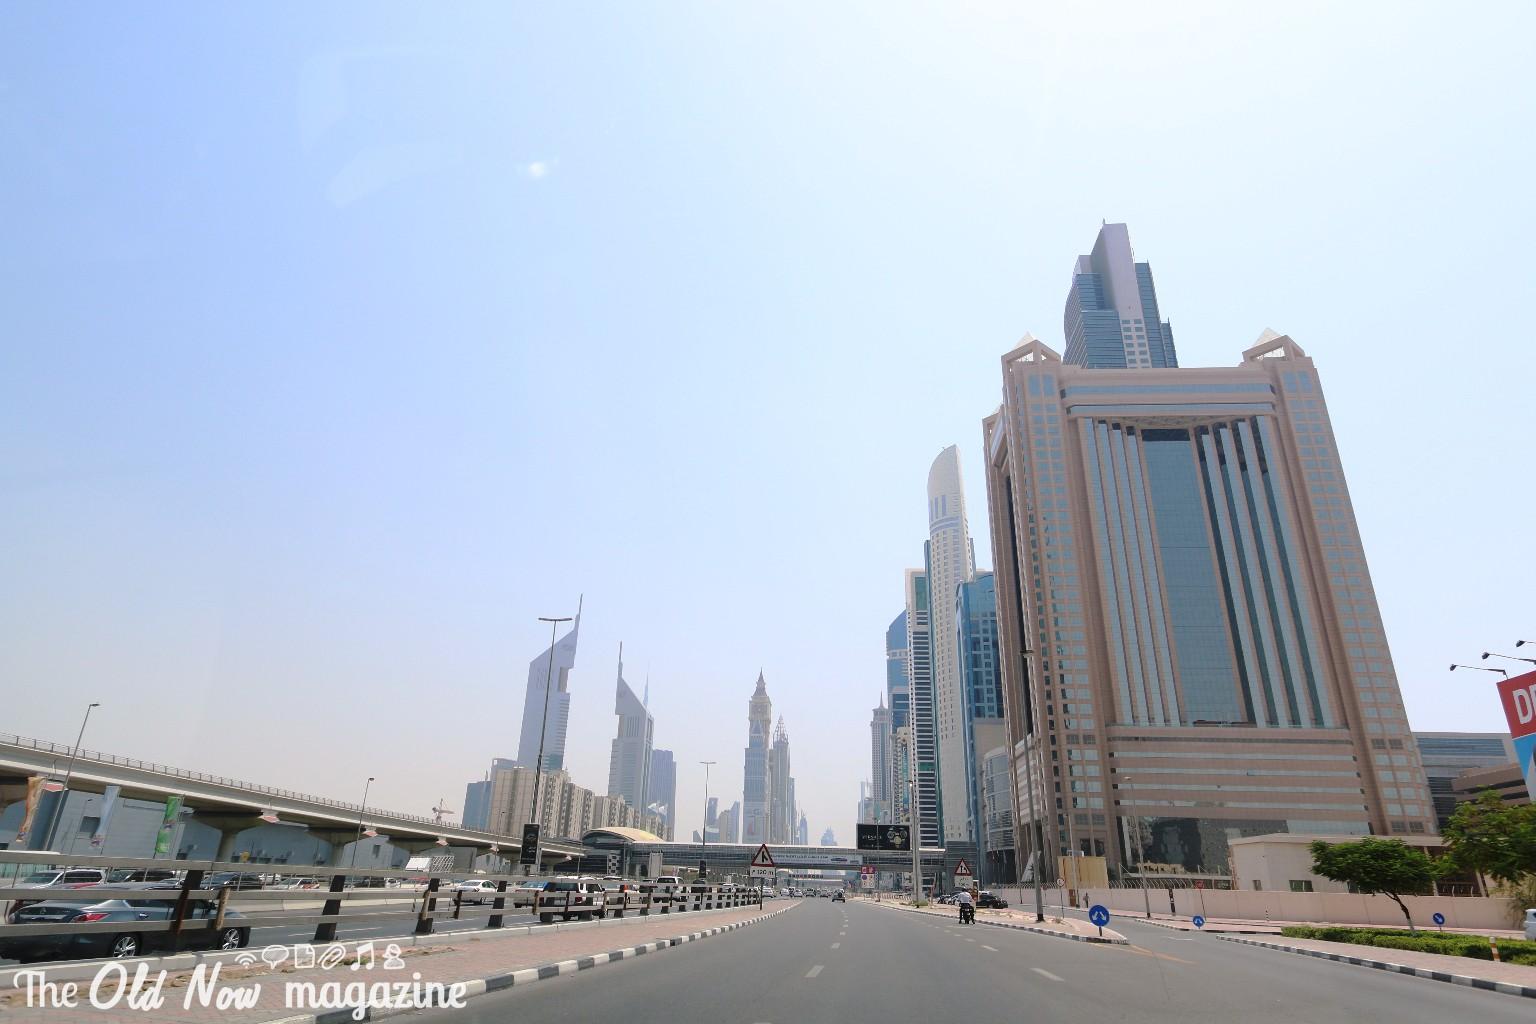 DUBAY DAY1 THEOLDNOW (7)